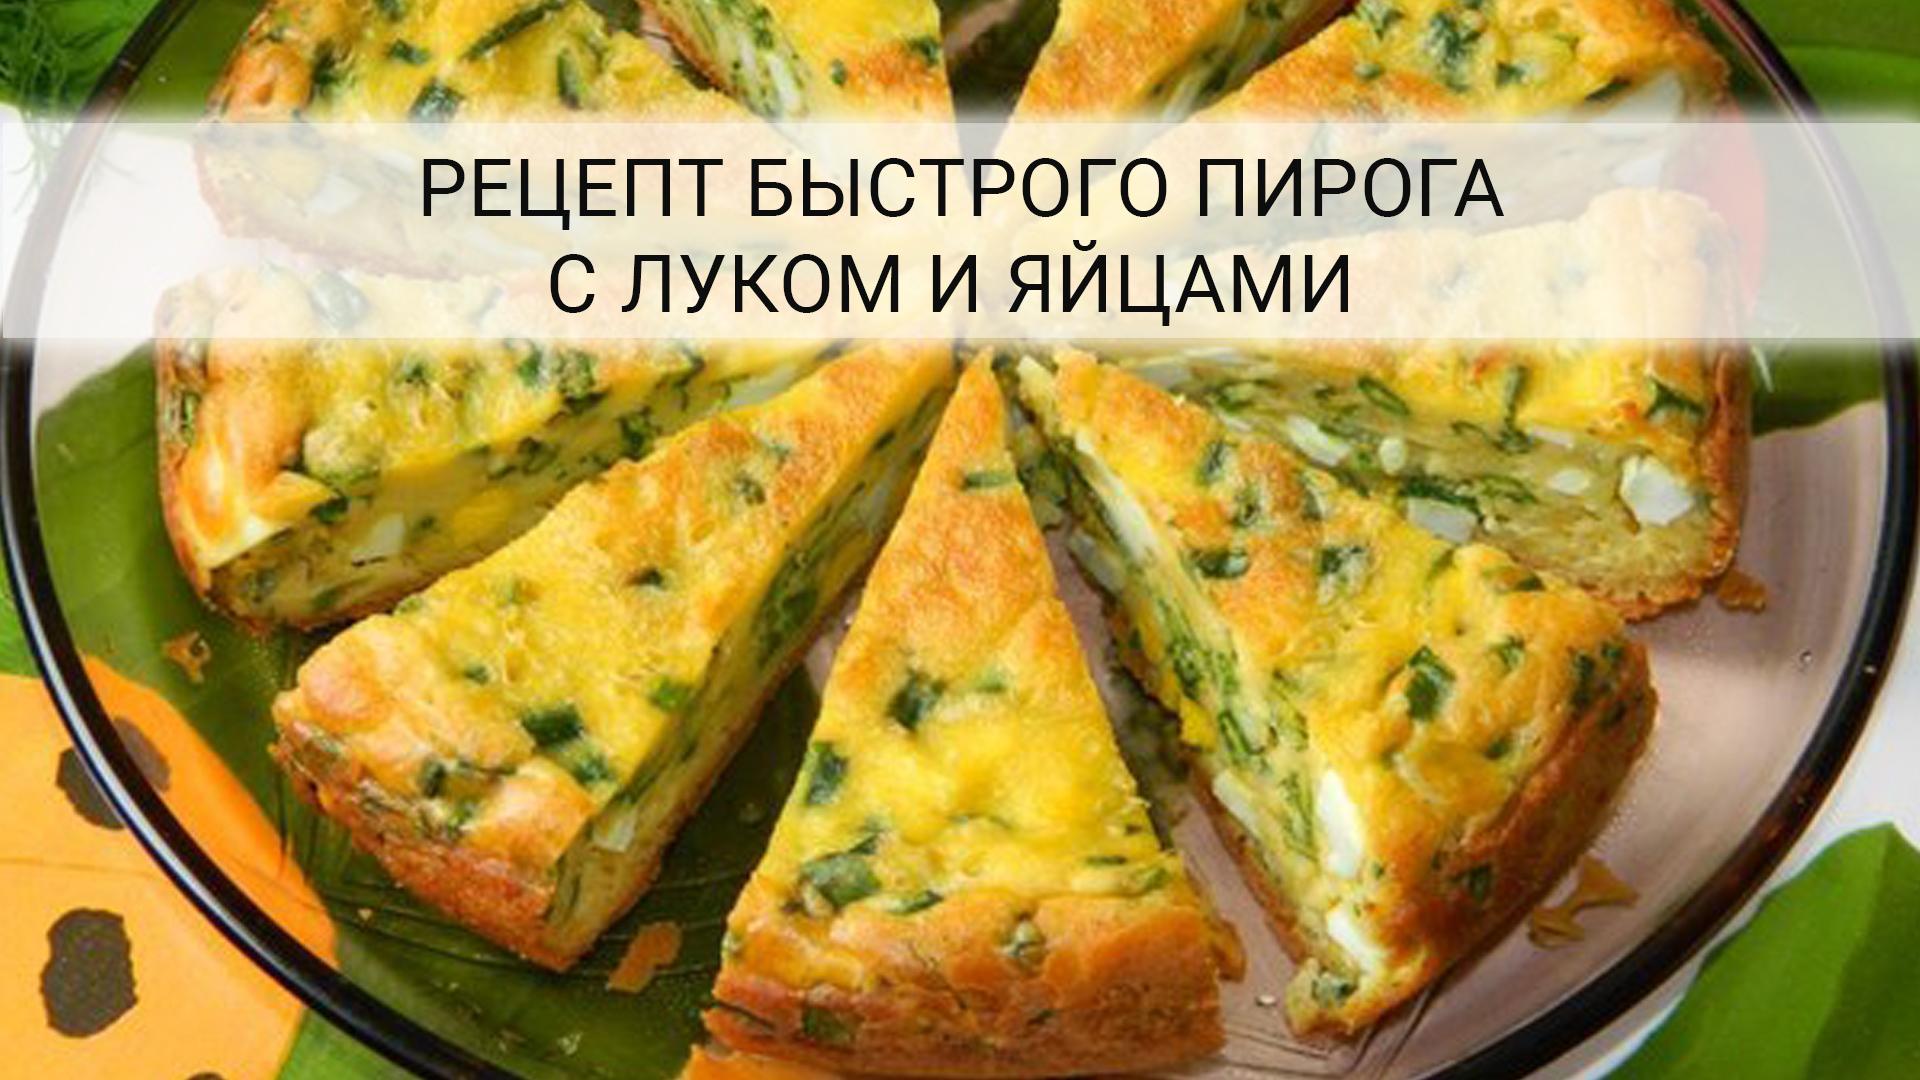 Рецепт пирога с луком и яйцами